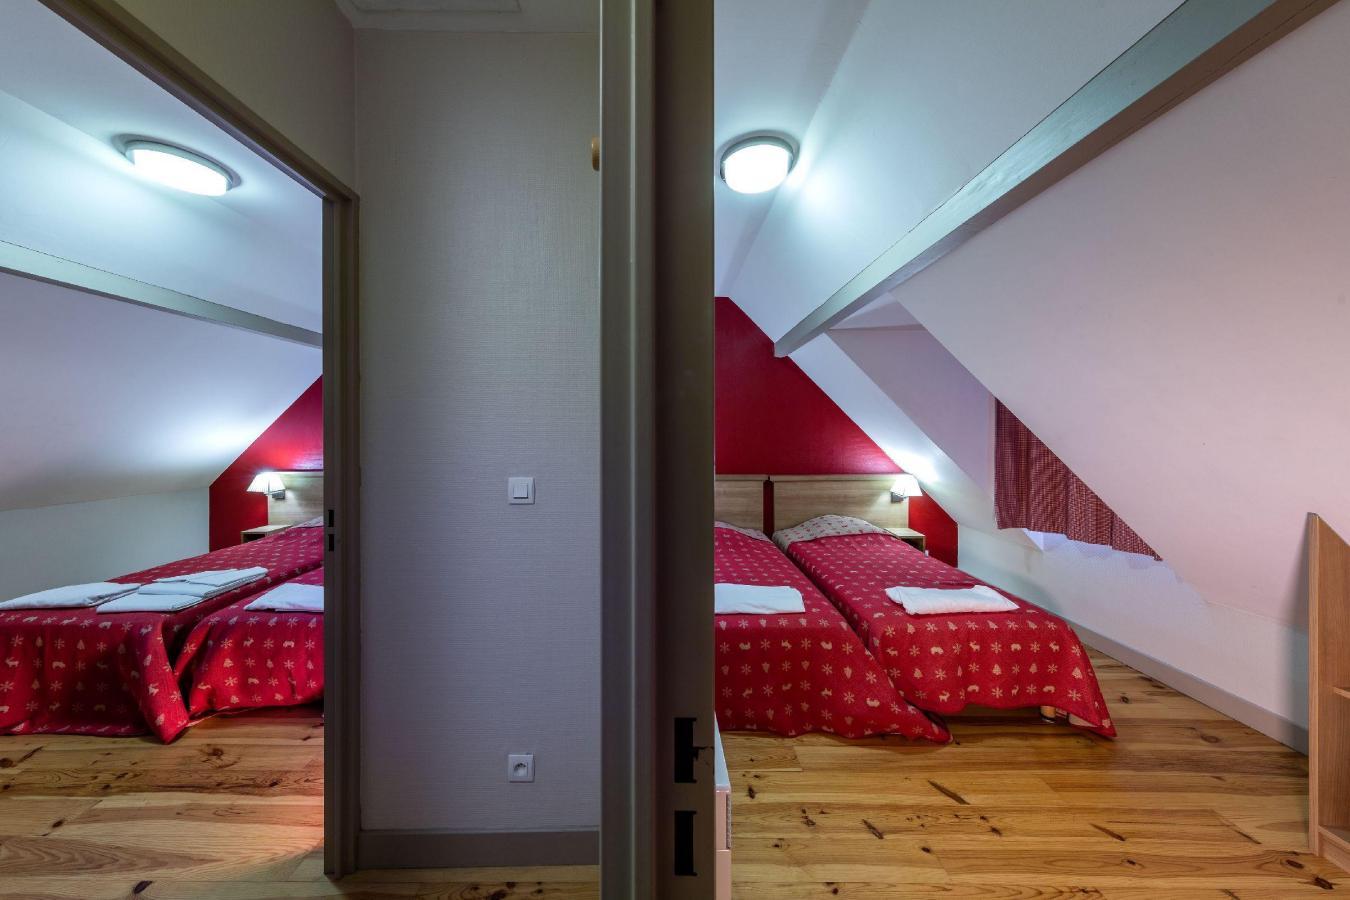 Location au ski Residence Les Trois Vallees - Saint Lary Soulan - Chambre mansardée